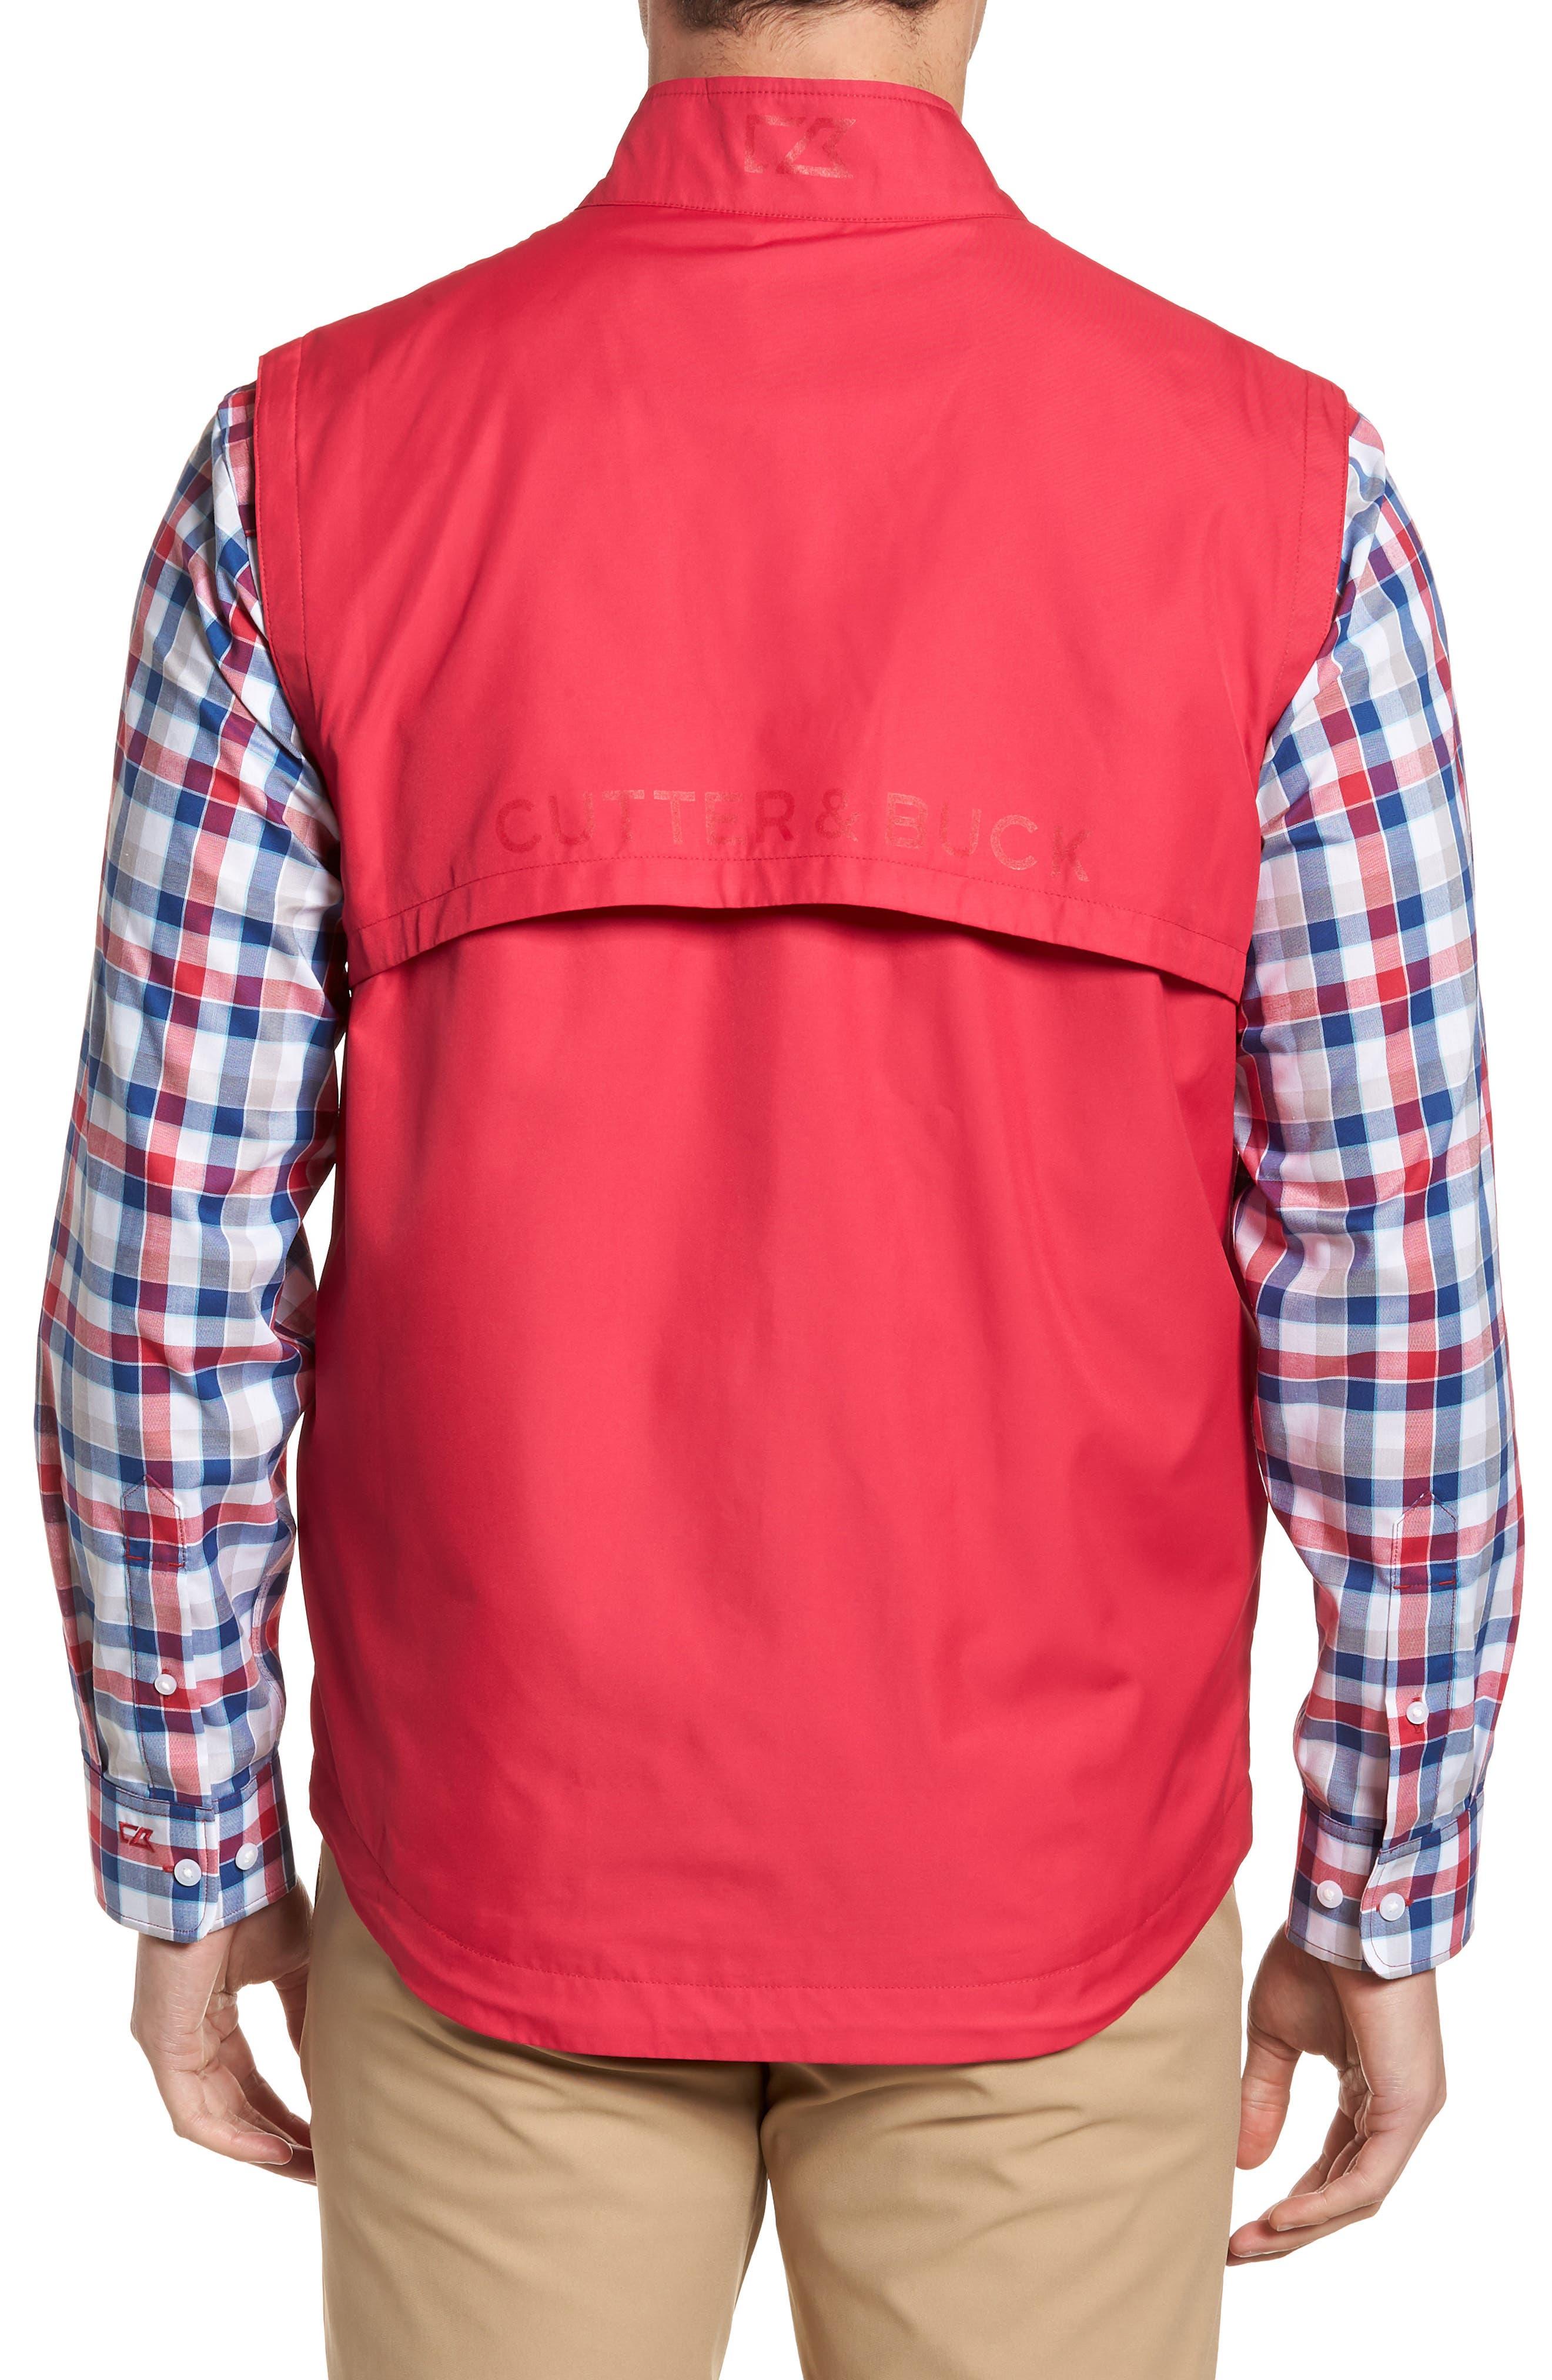 Nine Iron DryTec Zip Vest,                             Alternate thumbnail 2, color,                             Virtual